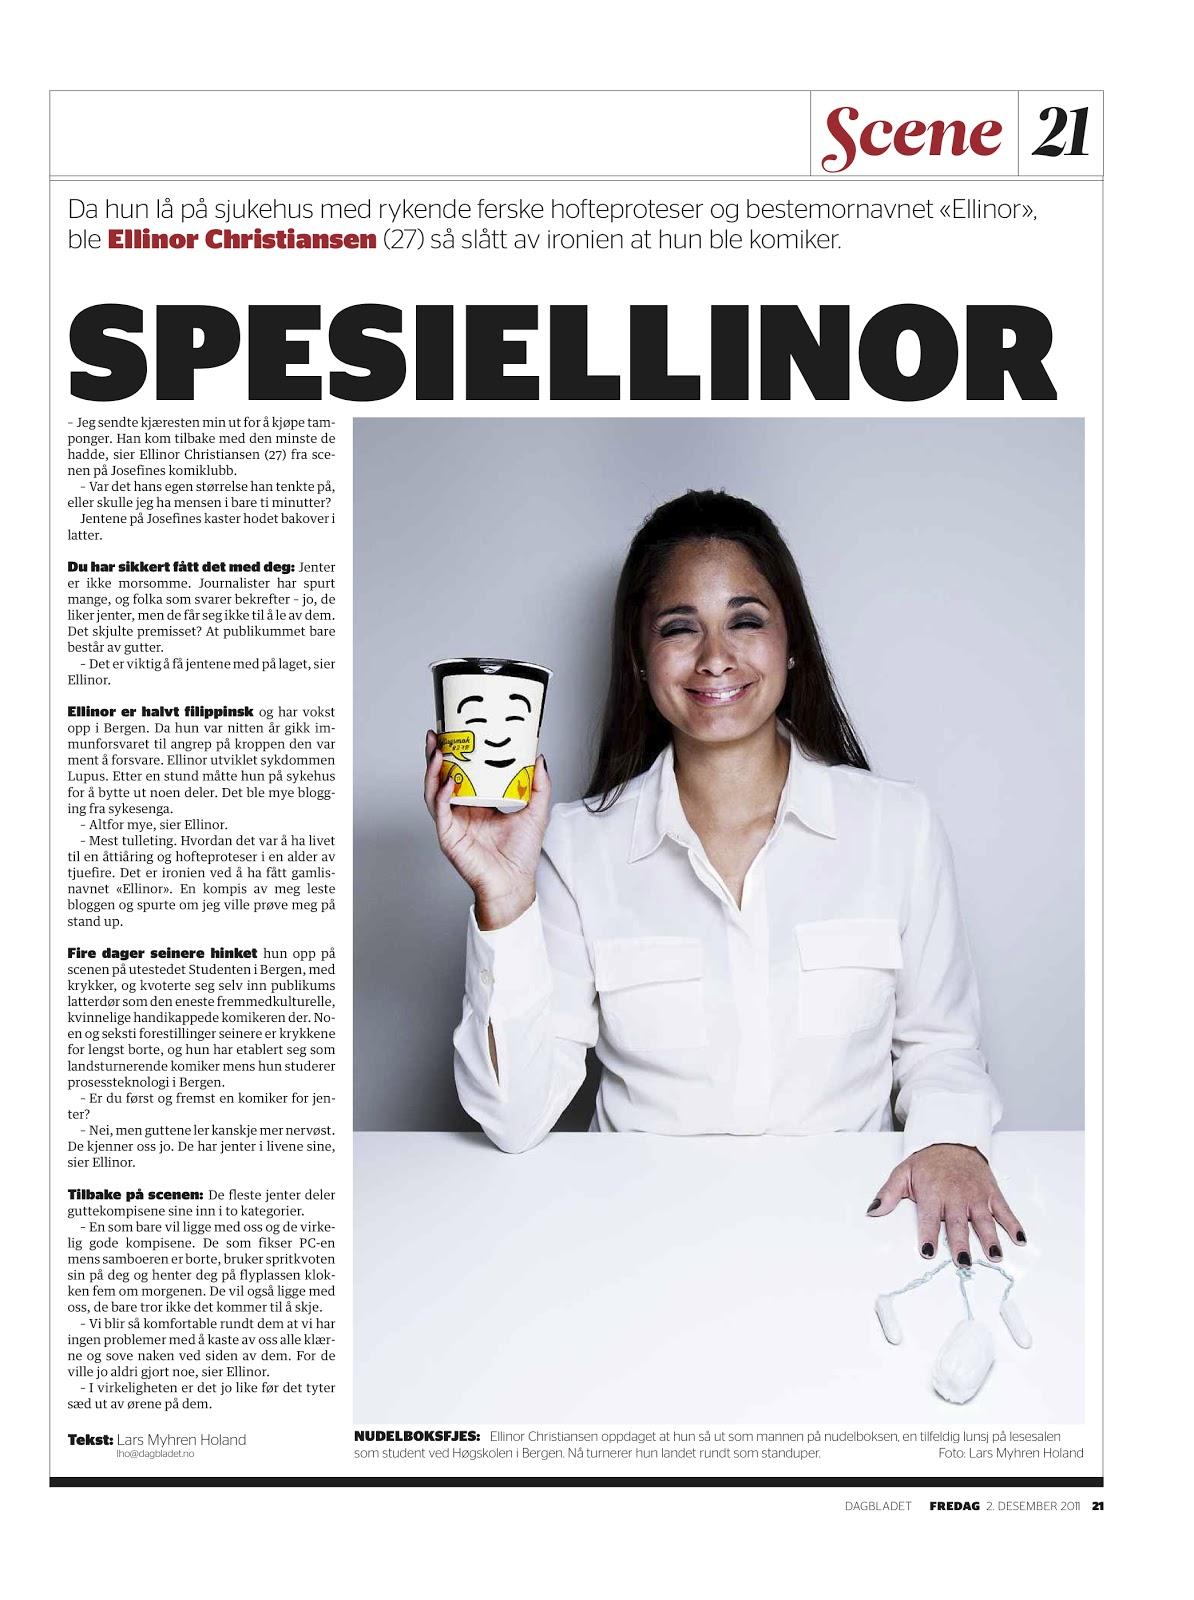 dagbladet_fredag-2.jpg